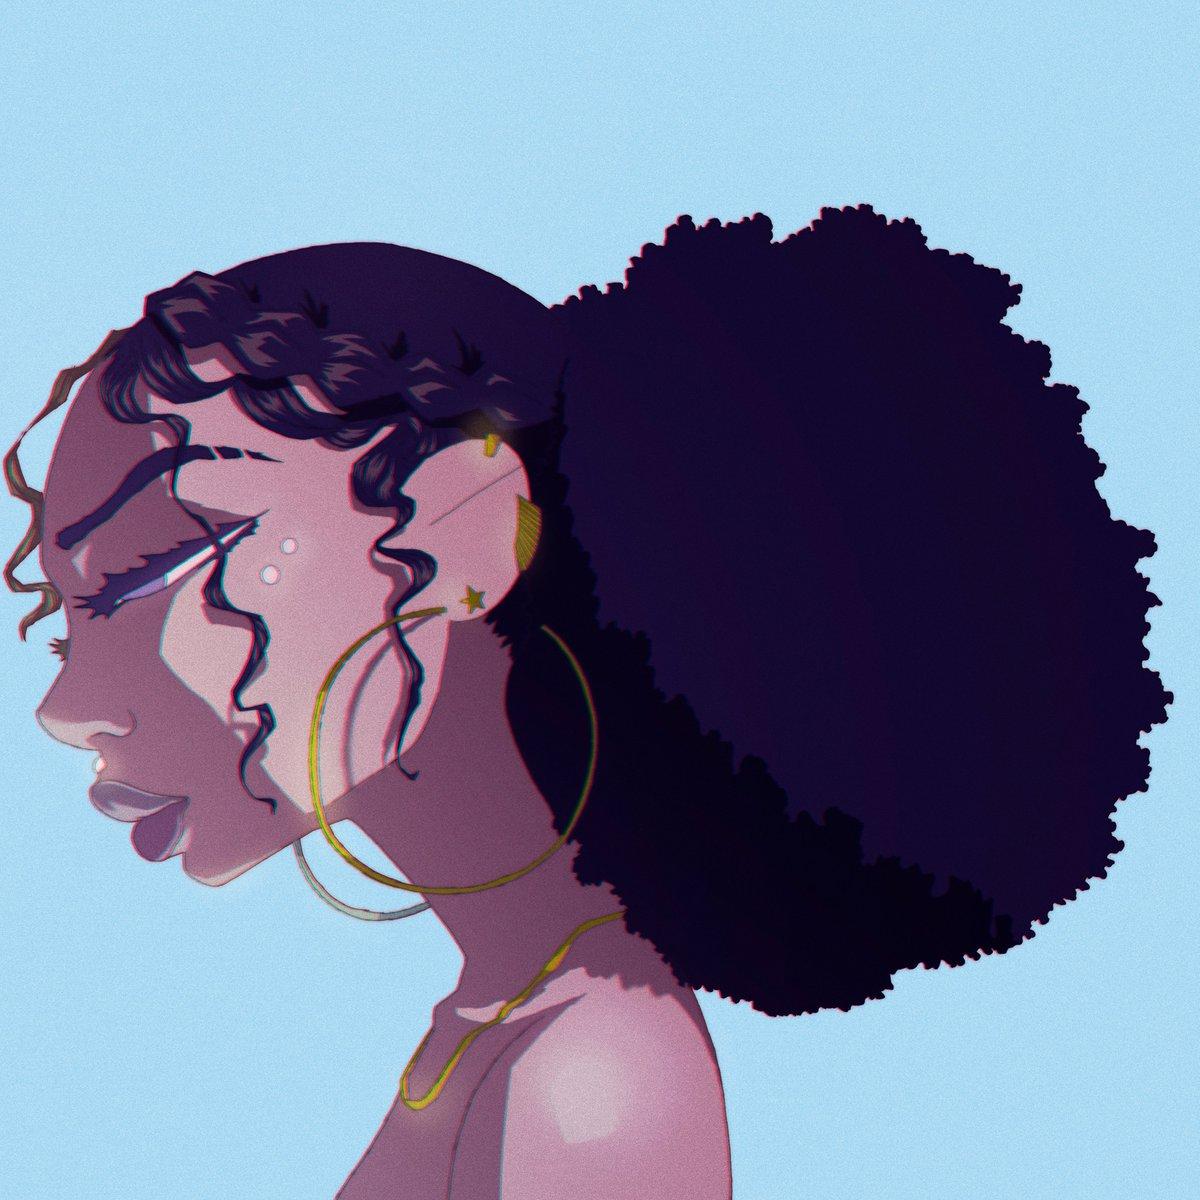 00's aesthetic  #characterdesign #designcharacter #charadesign #color #concept #conceptart #black #blackpower #blacklivesmatter